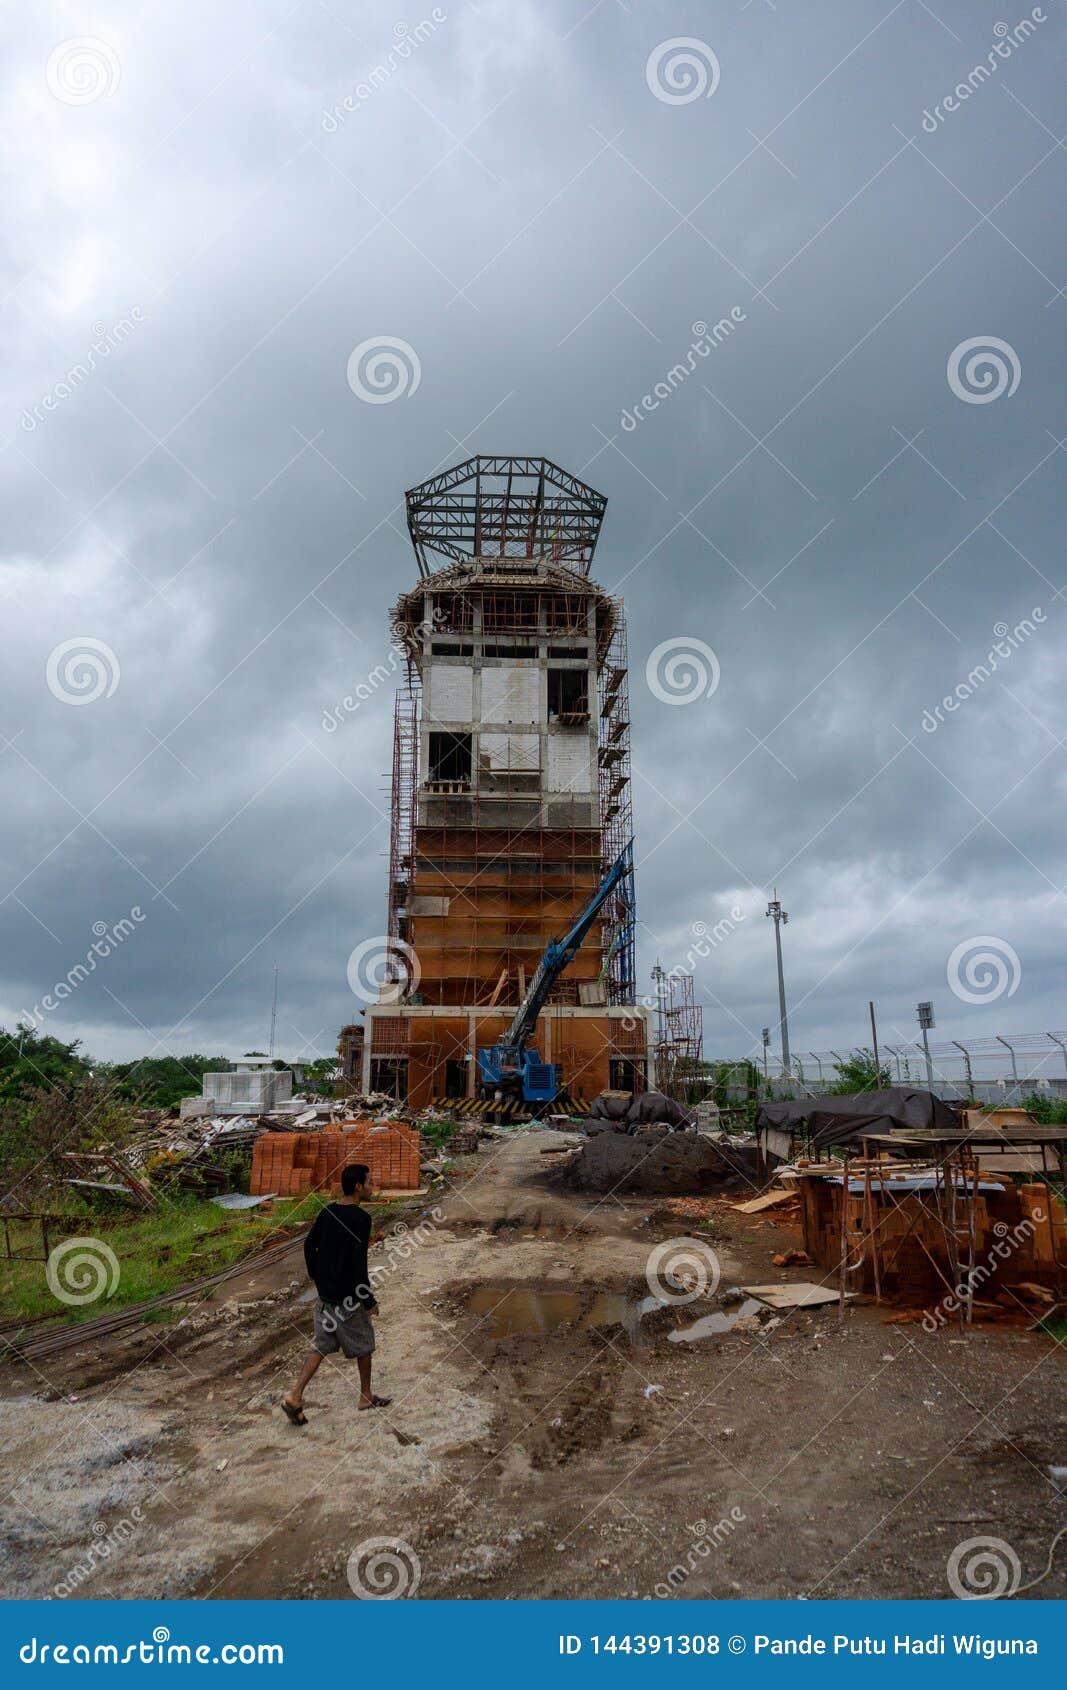 BADUNG,BALI/INDONESIA-JANUARY 15 2017年:未完成的航空交通管制塔在拉伊巴克罕机场巴厘岛